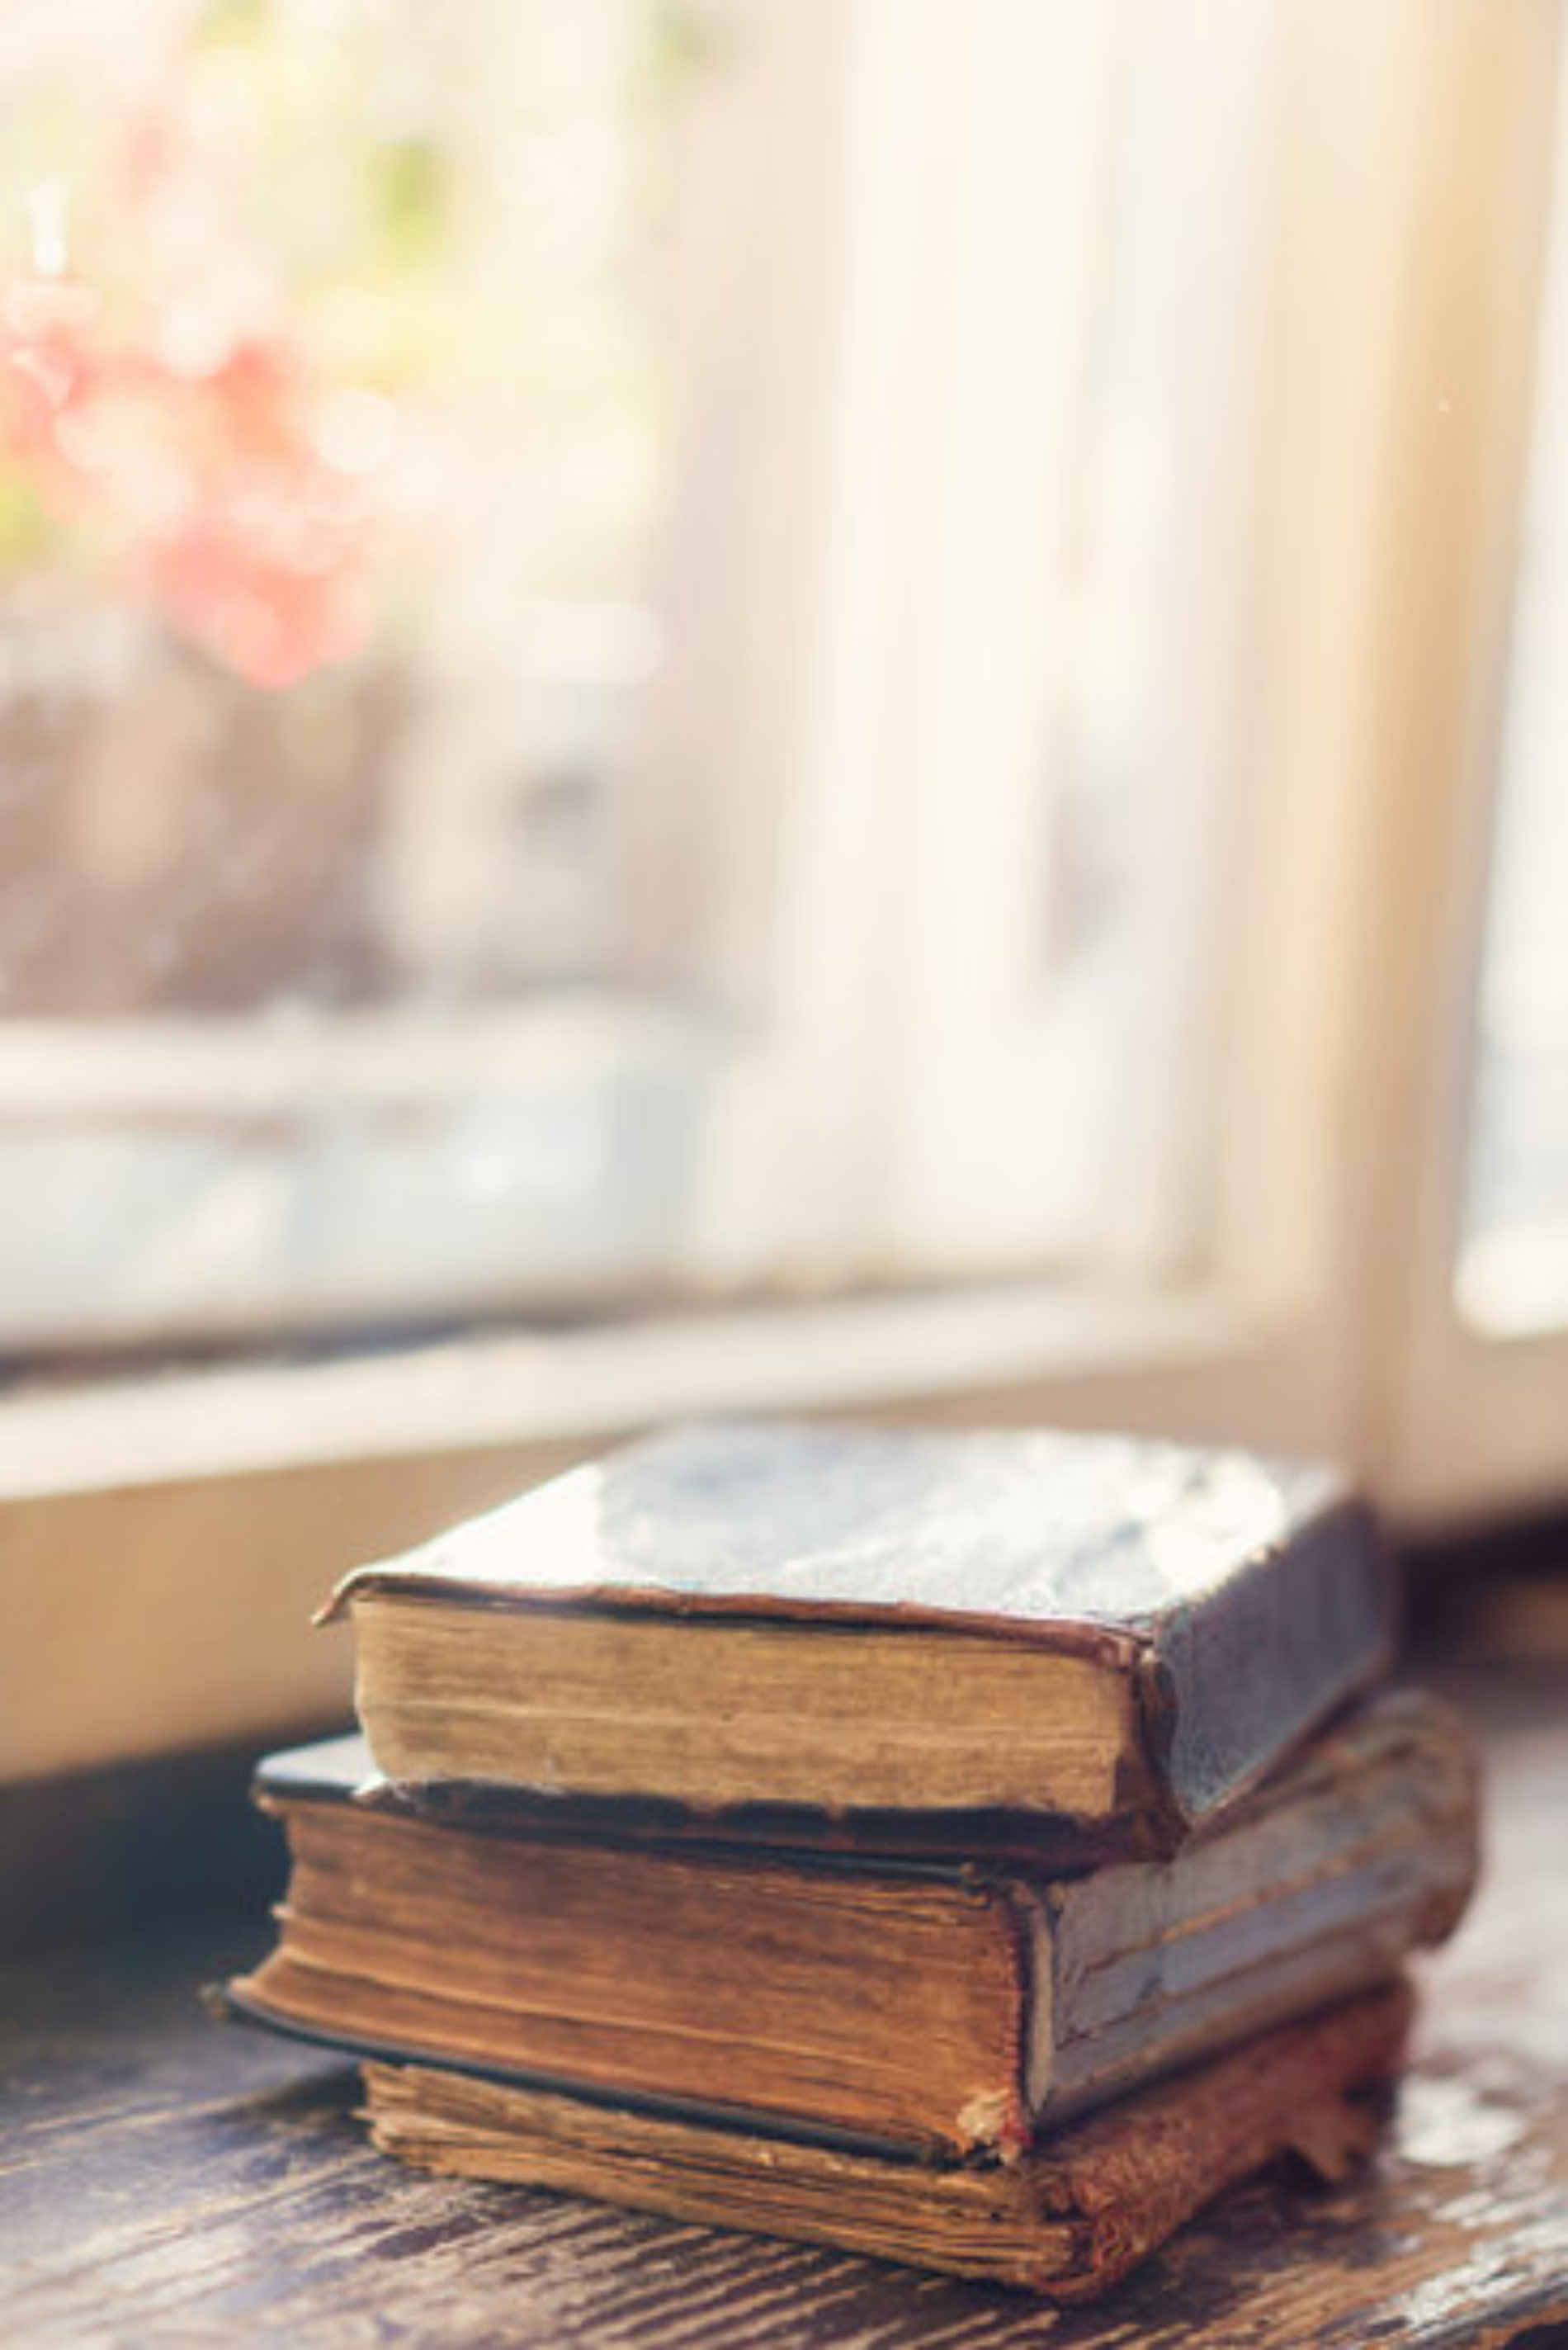 O que é o Analfabetismo funcional?